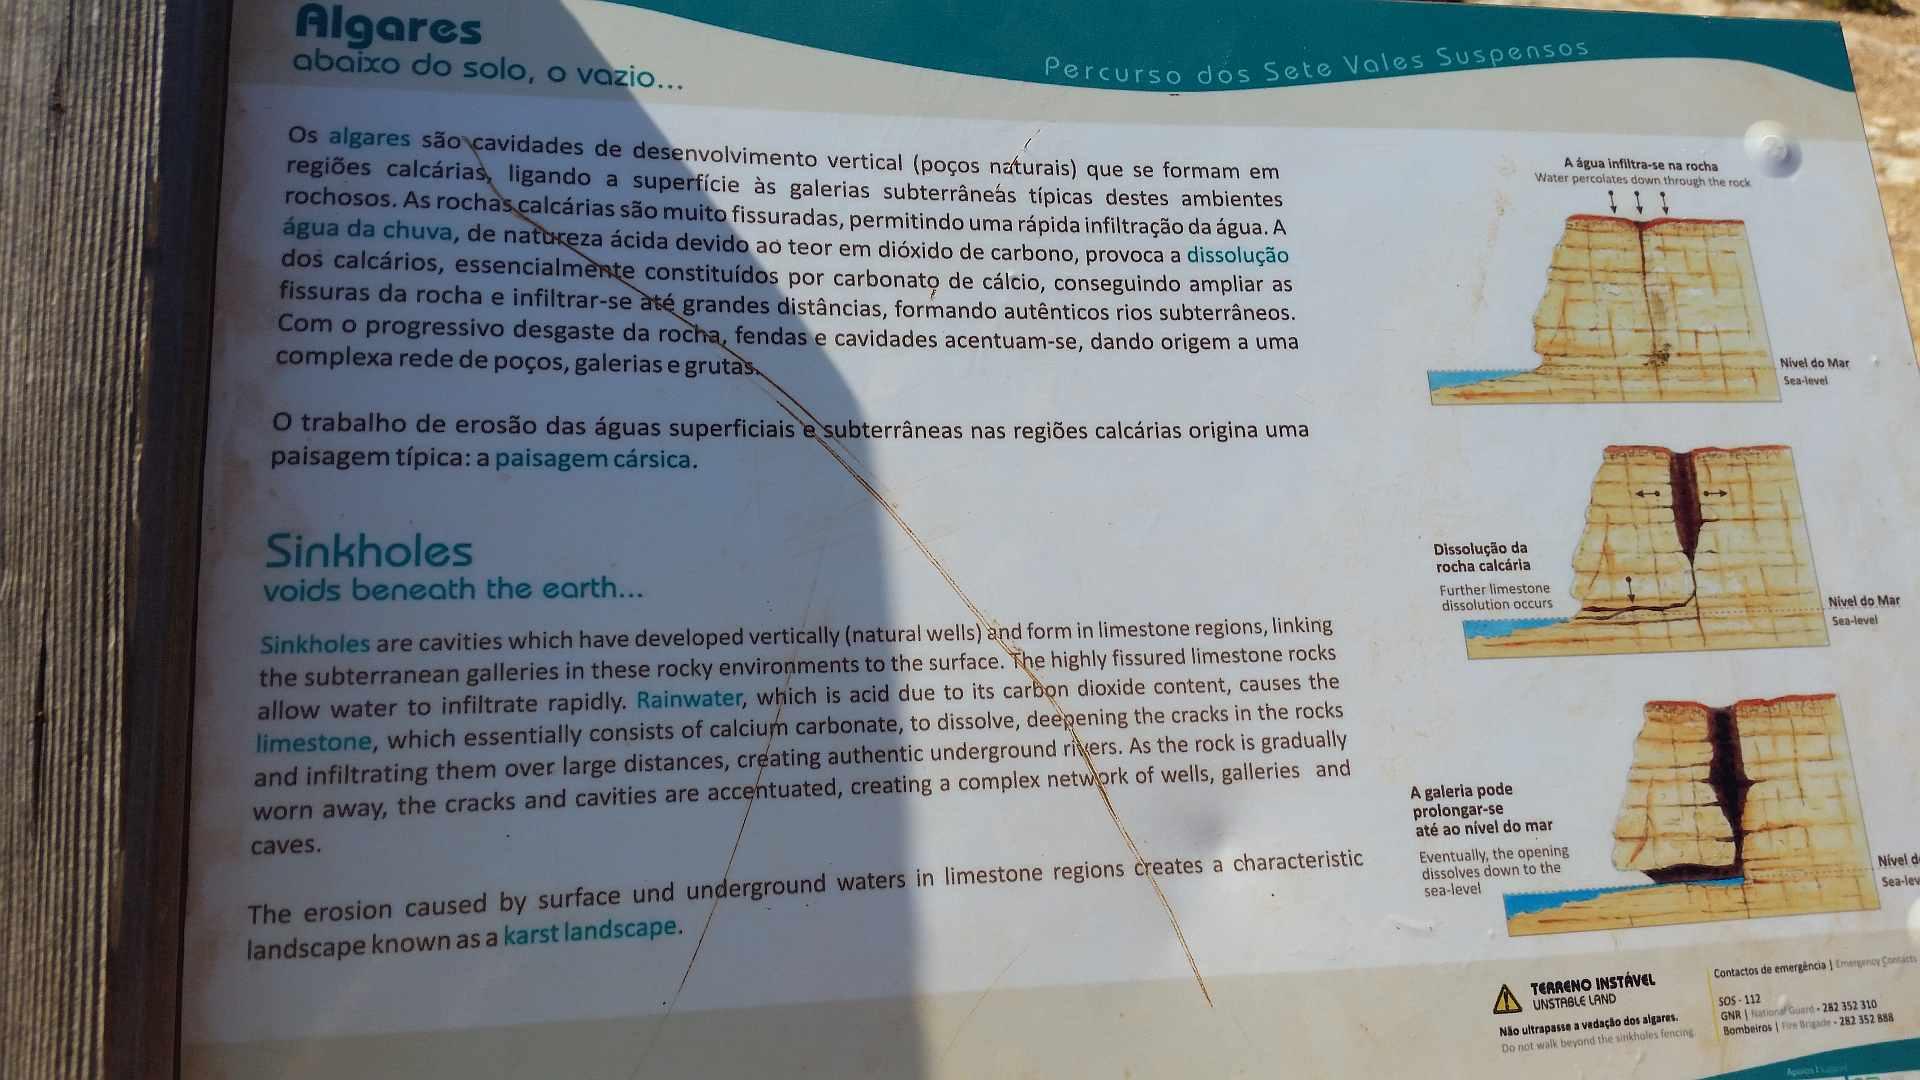 Lagao - Algarve - what is a sinkhole